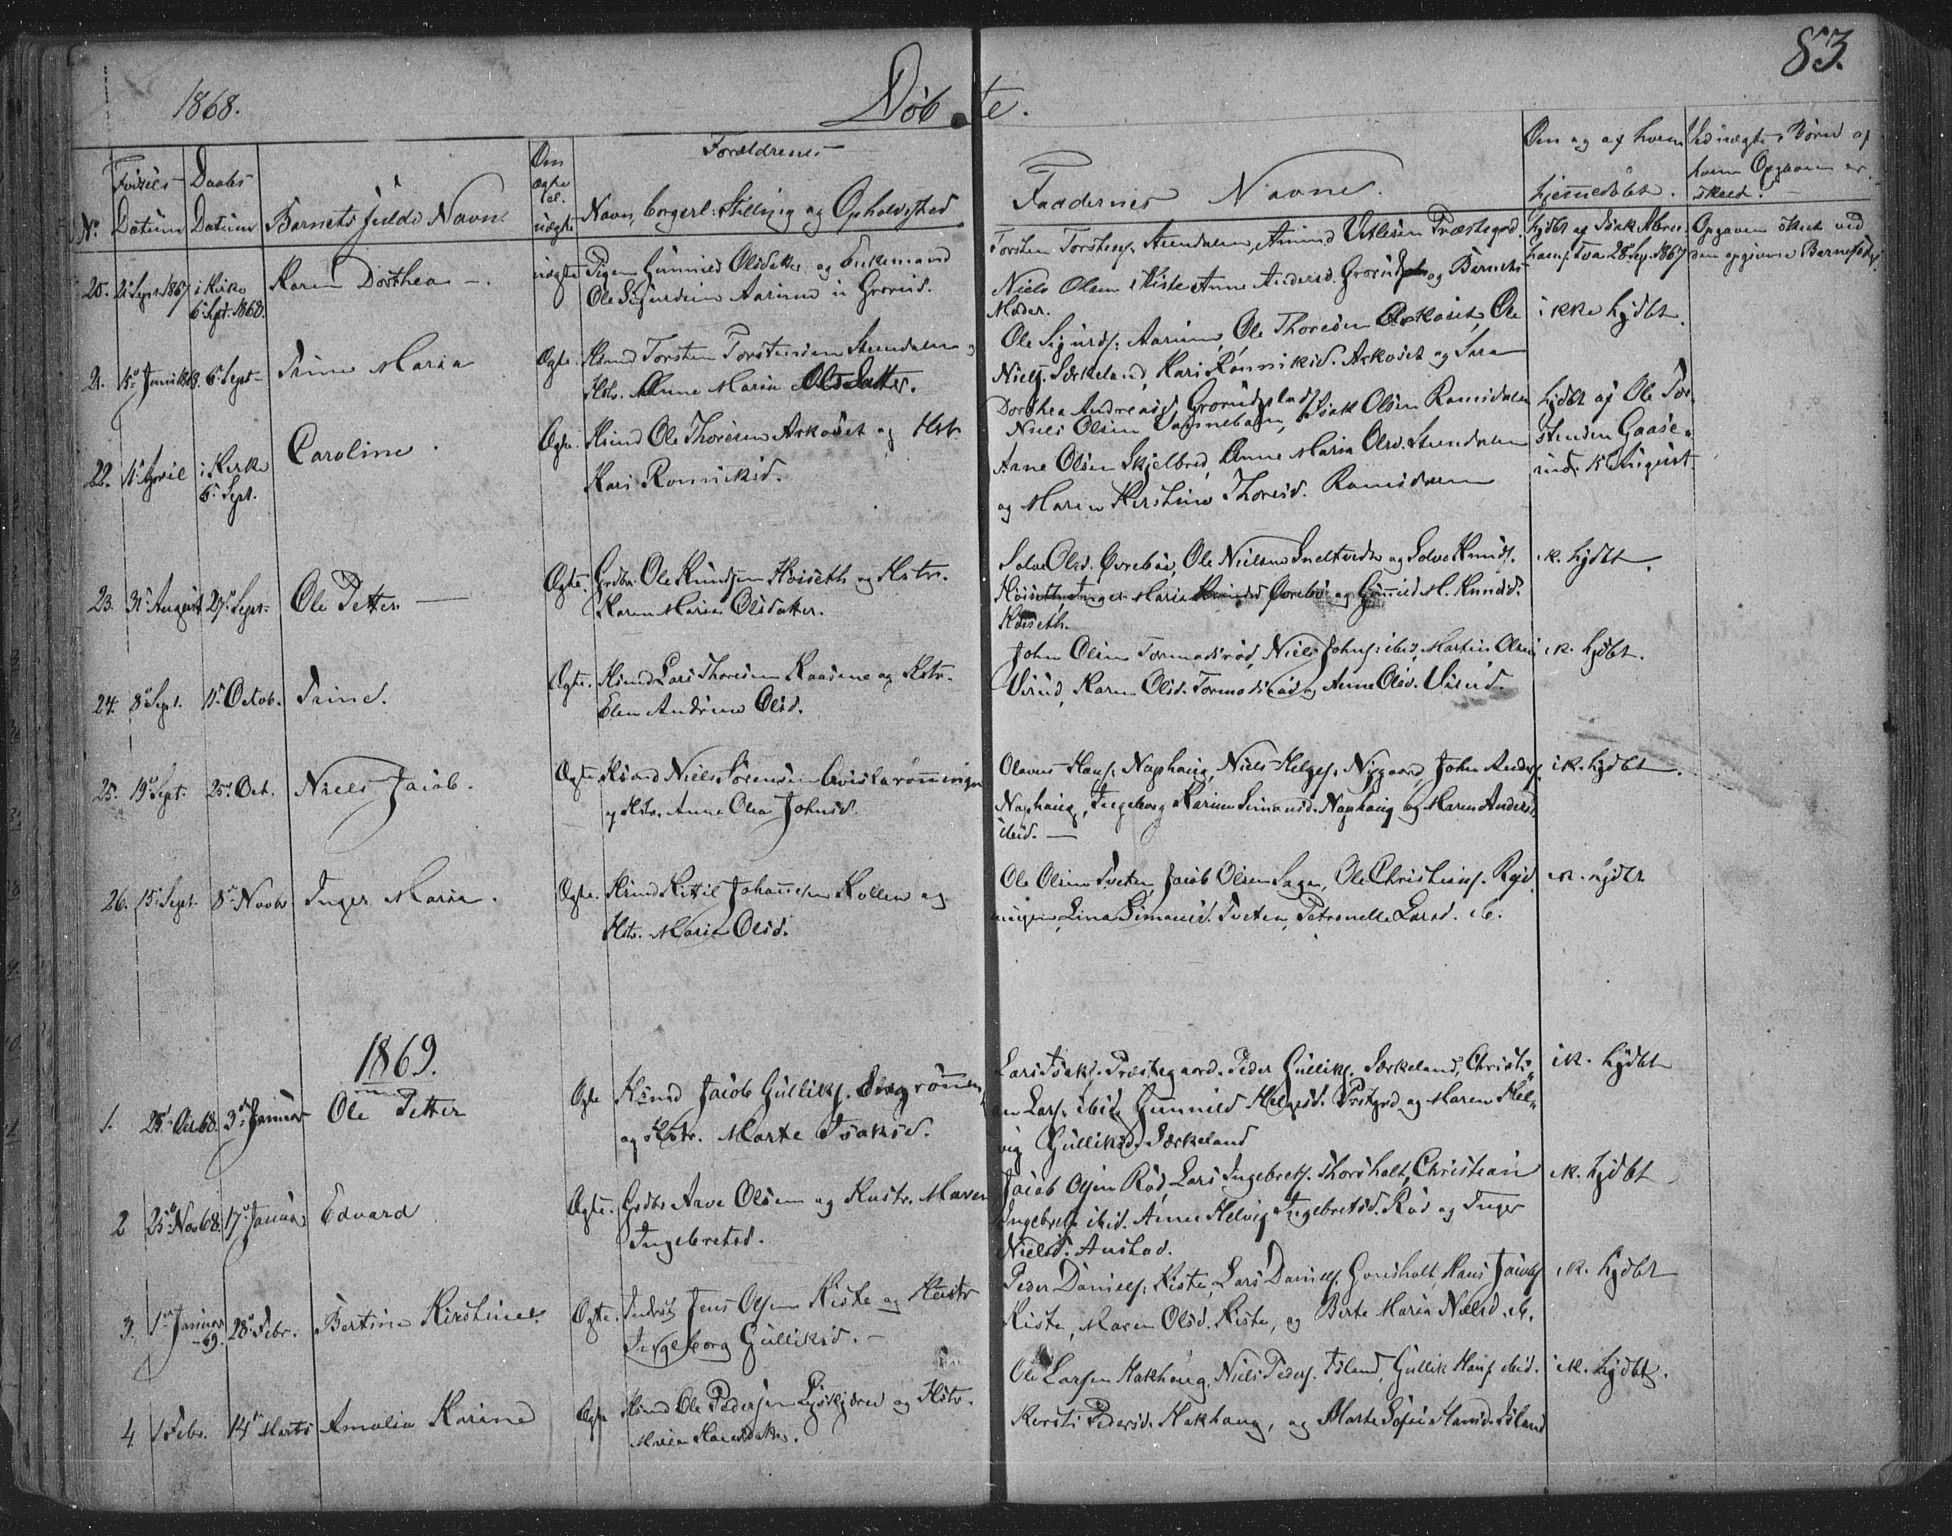 SAKO, Siljan kirkebøker, F/Fa/L0001: Parish register (official) no. 1, 1831-1870, p. 83